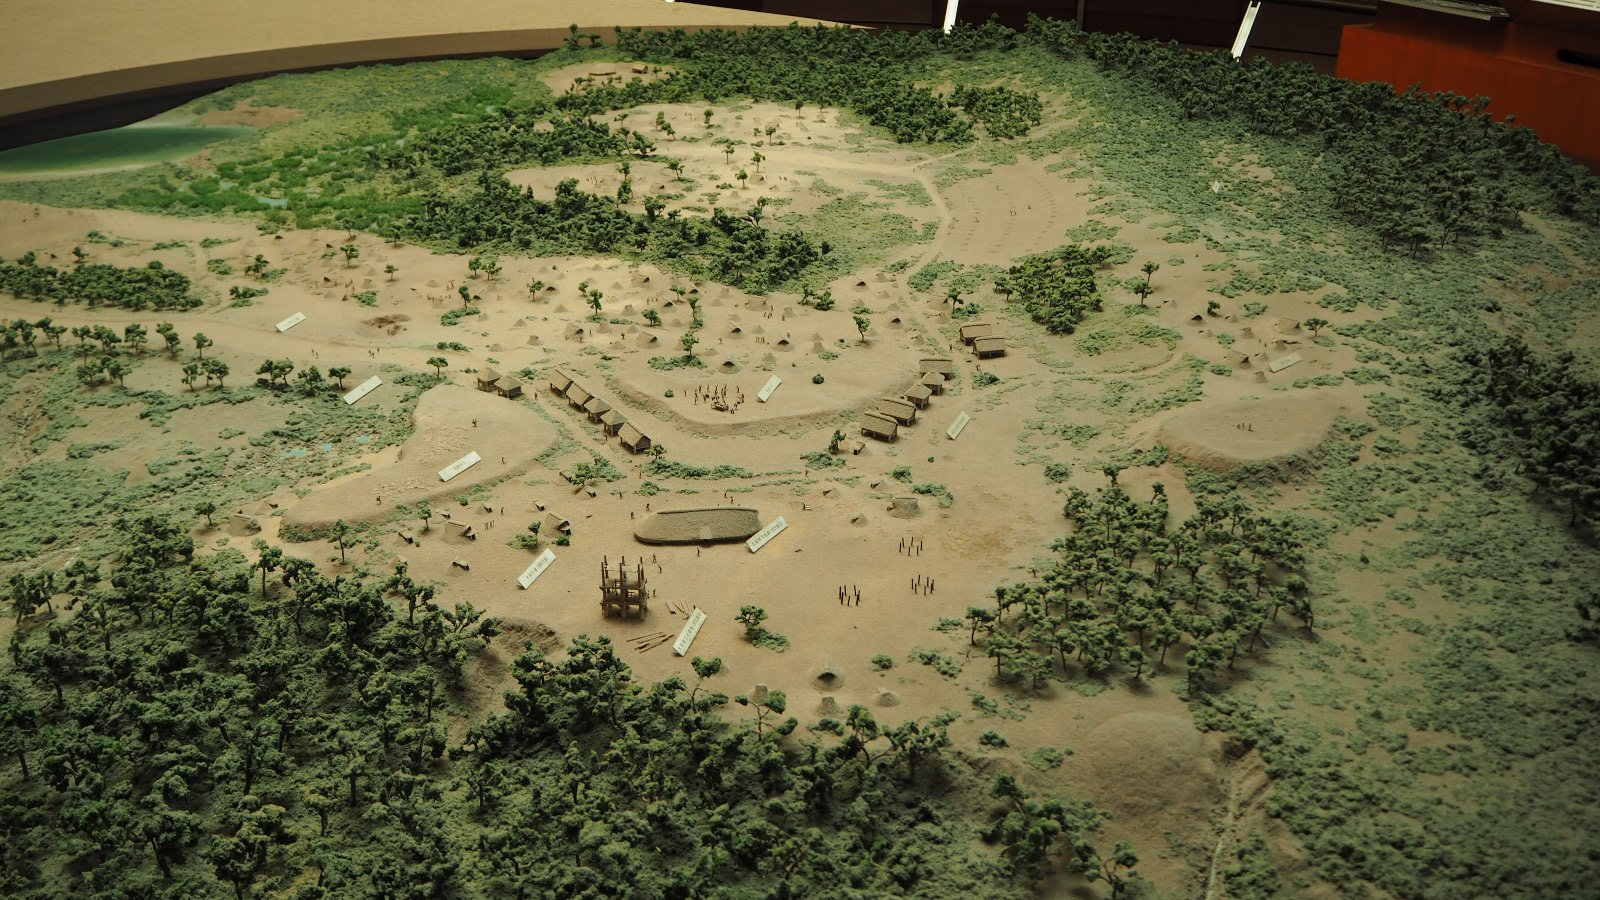 Overview of Aomori